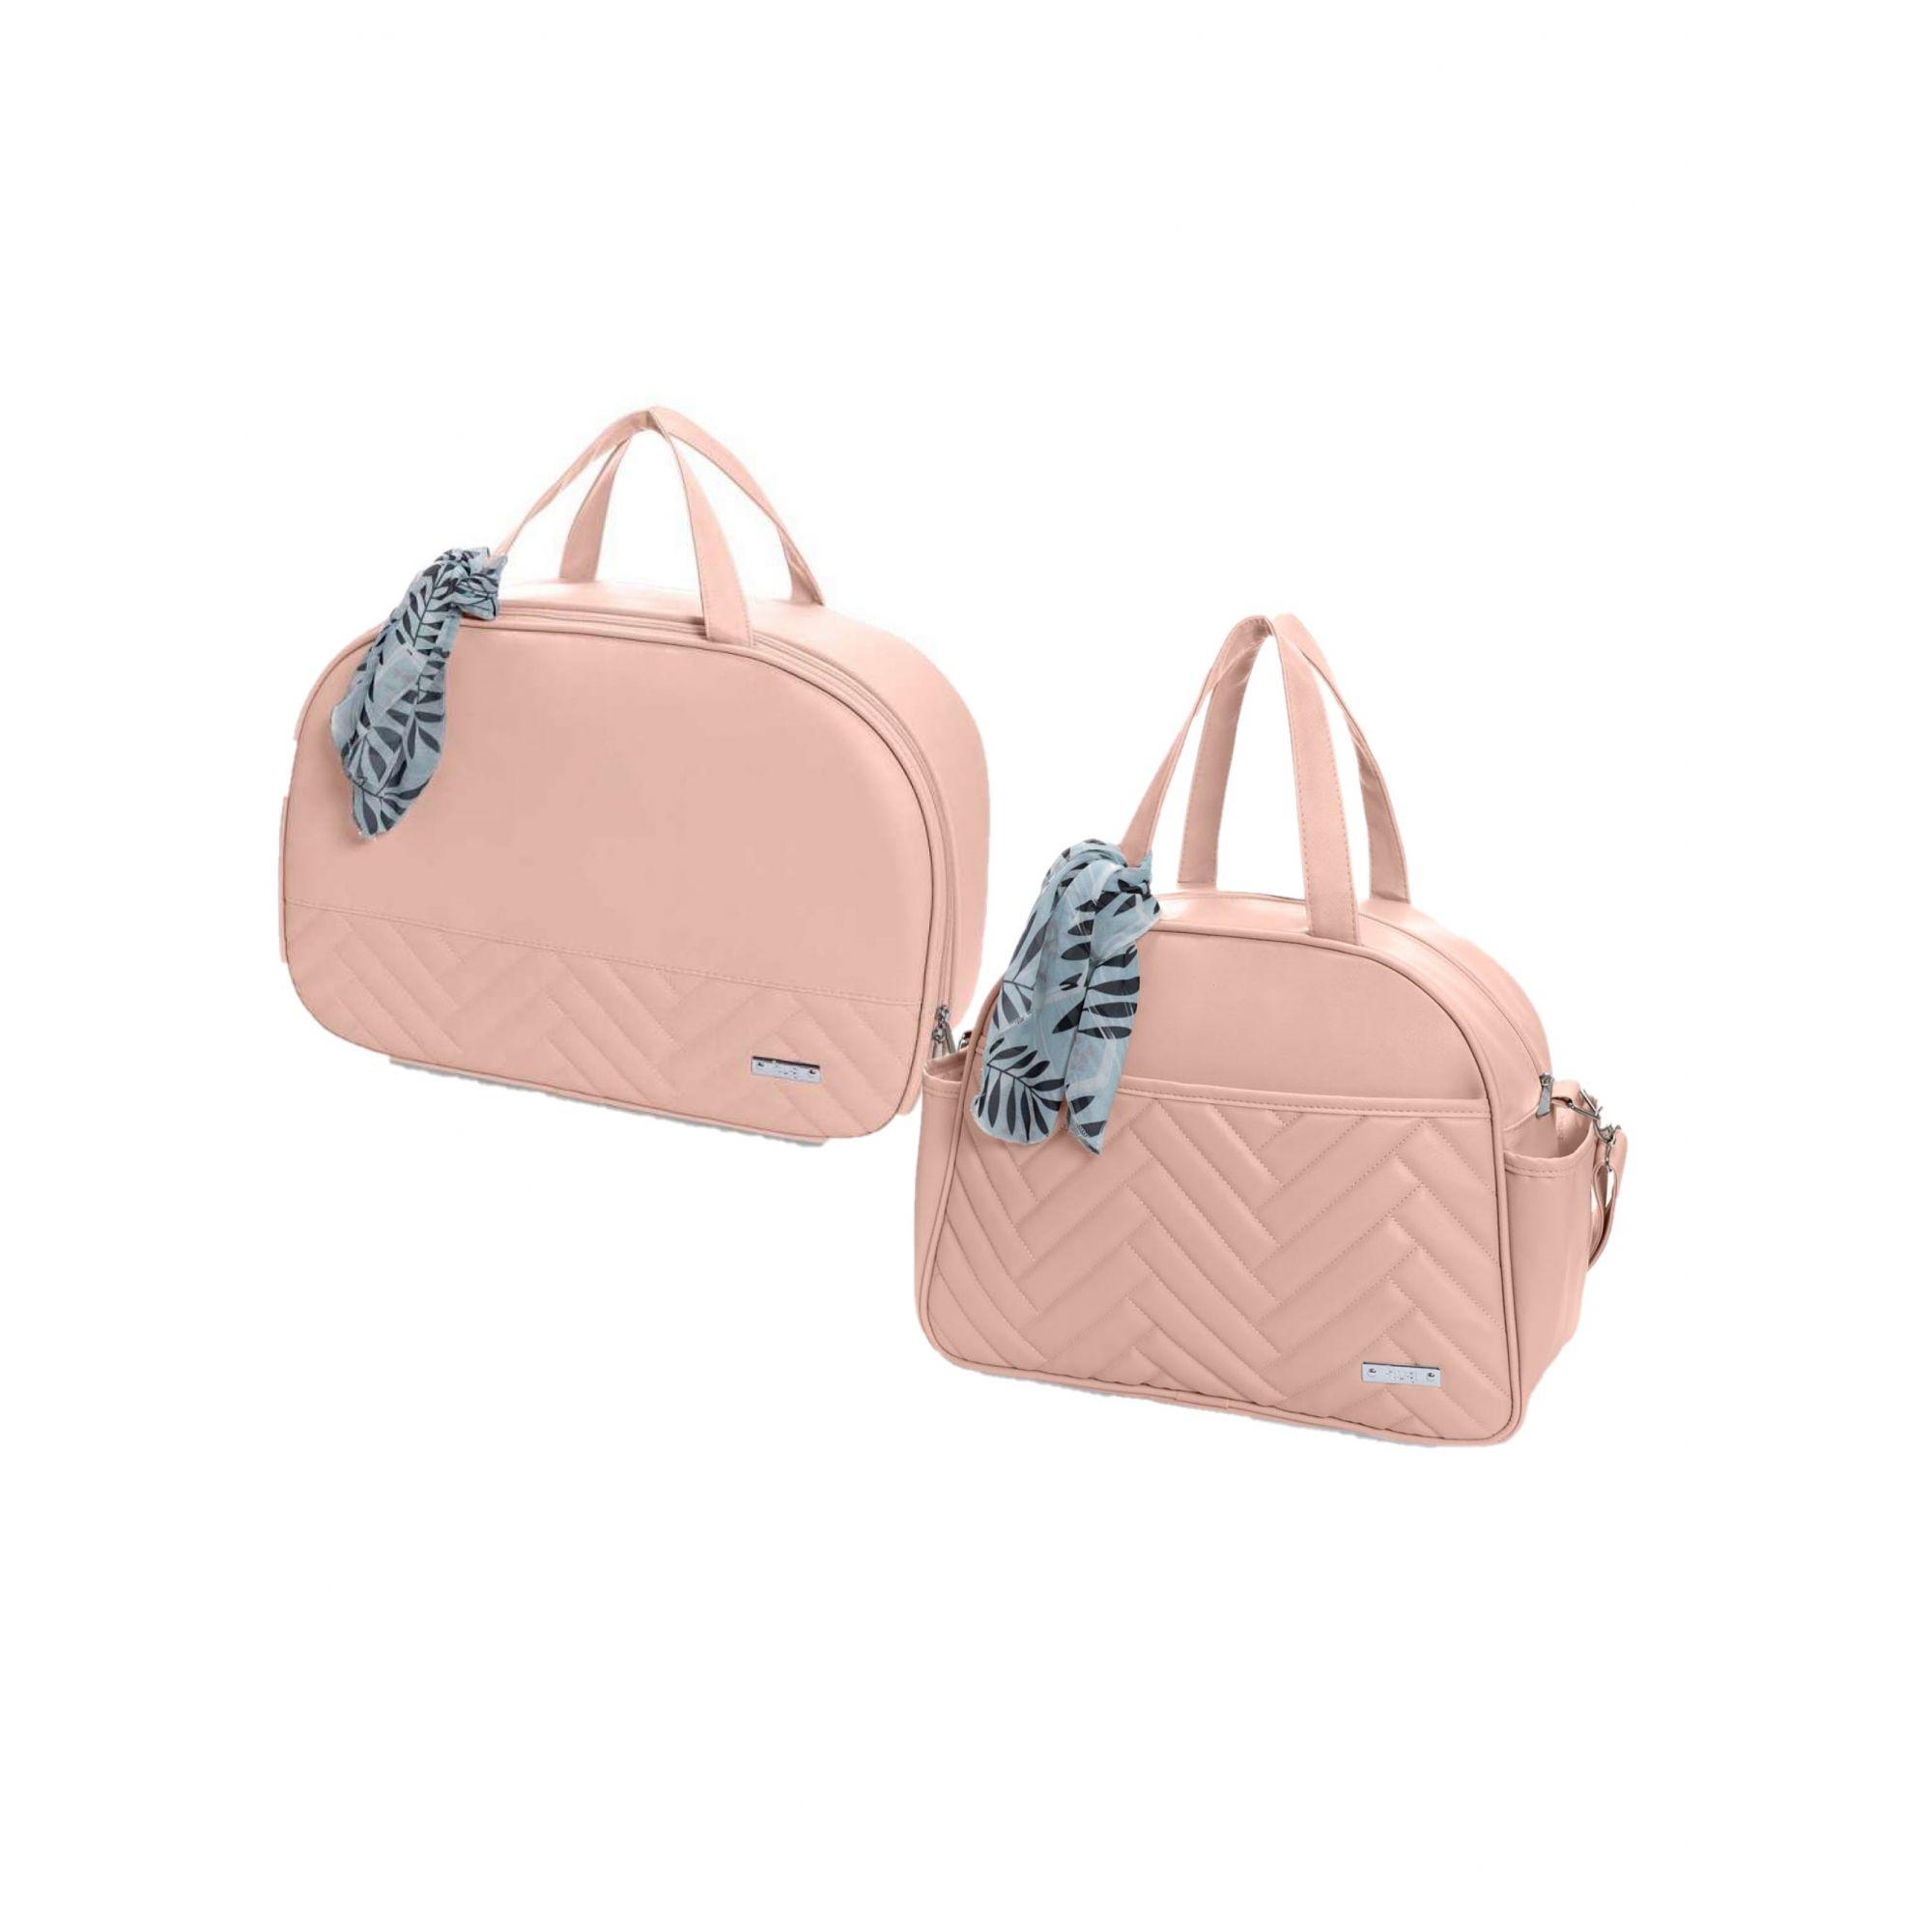 Kit bolsa de maternidade Rosa Munique - 2 pçs - Hug (bolsa e mala)